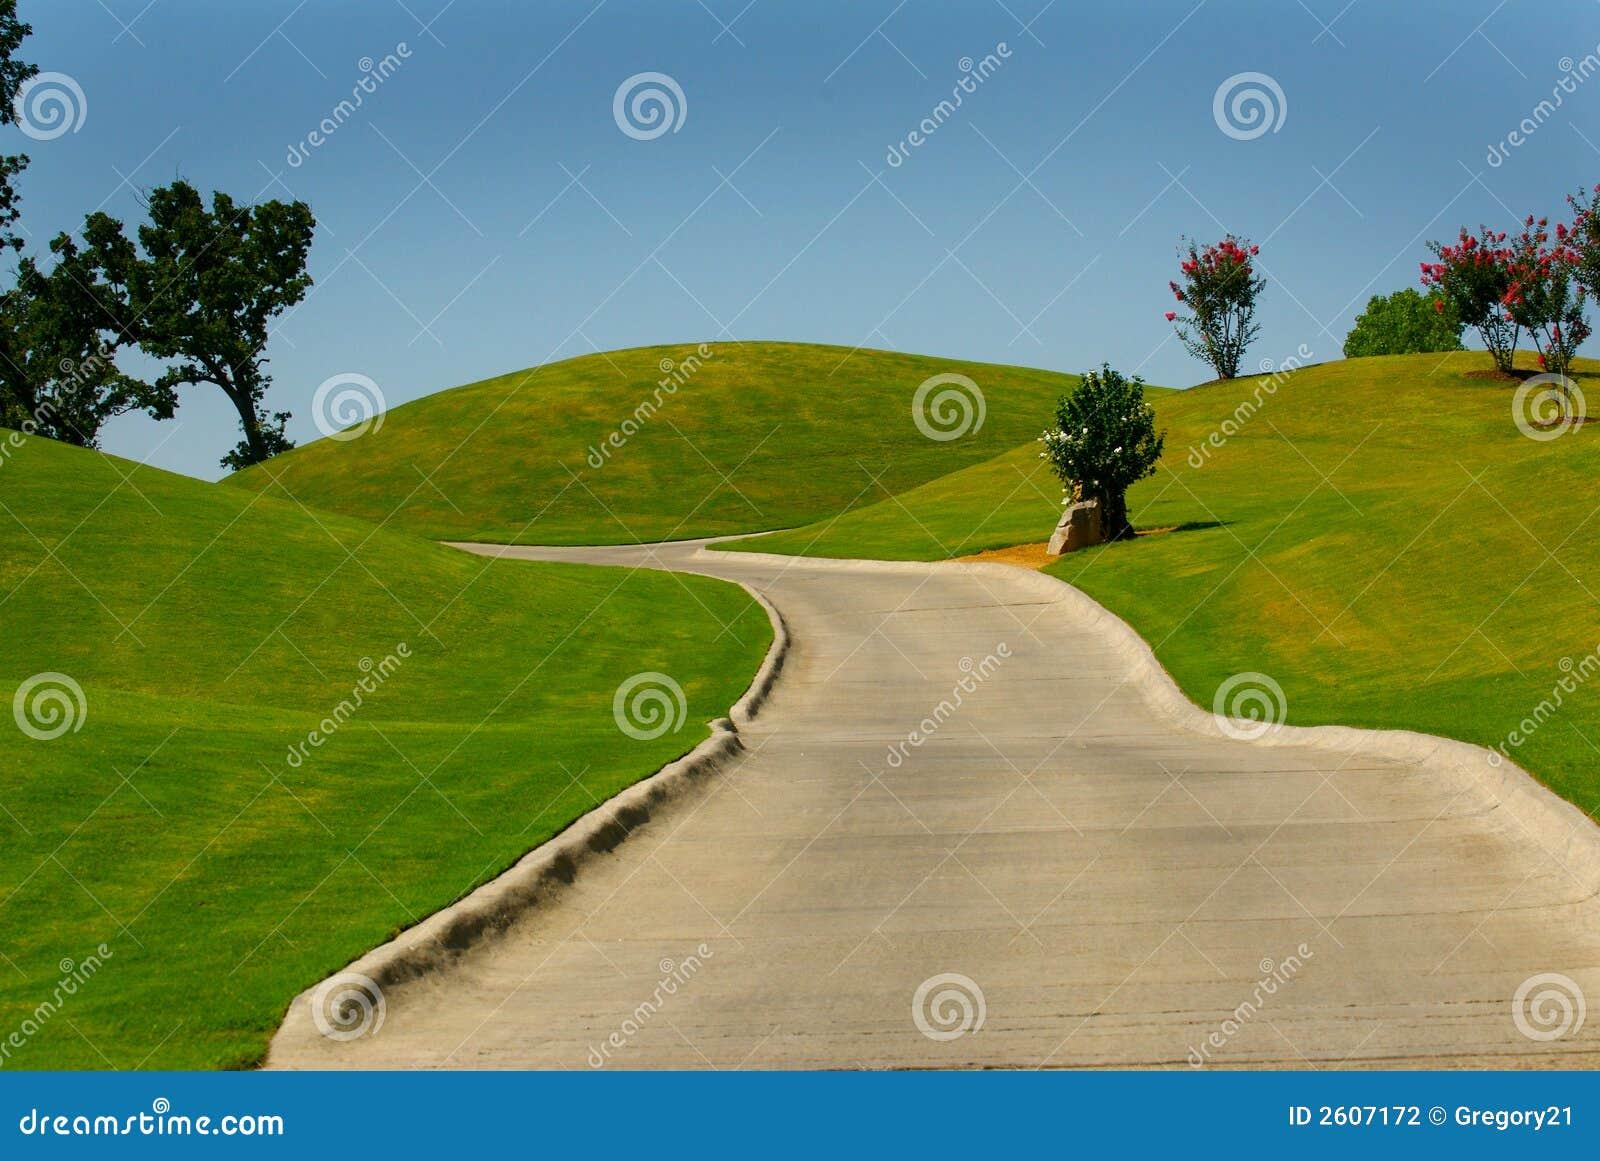 Golf Cart Path Stock Photography - Image: 2607172 Golf Ball On Tee Clipart